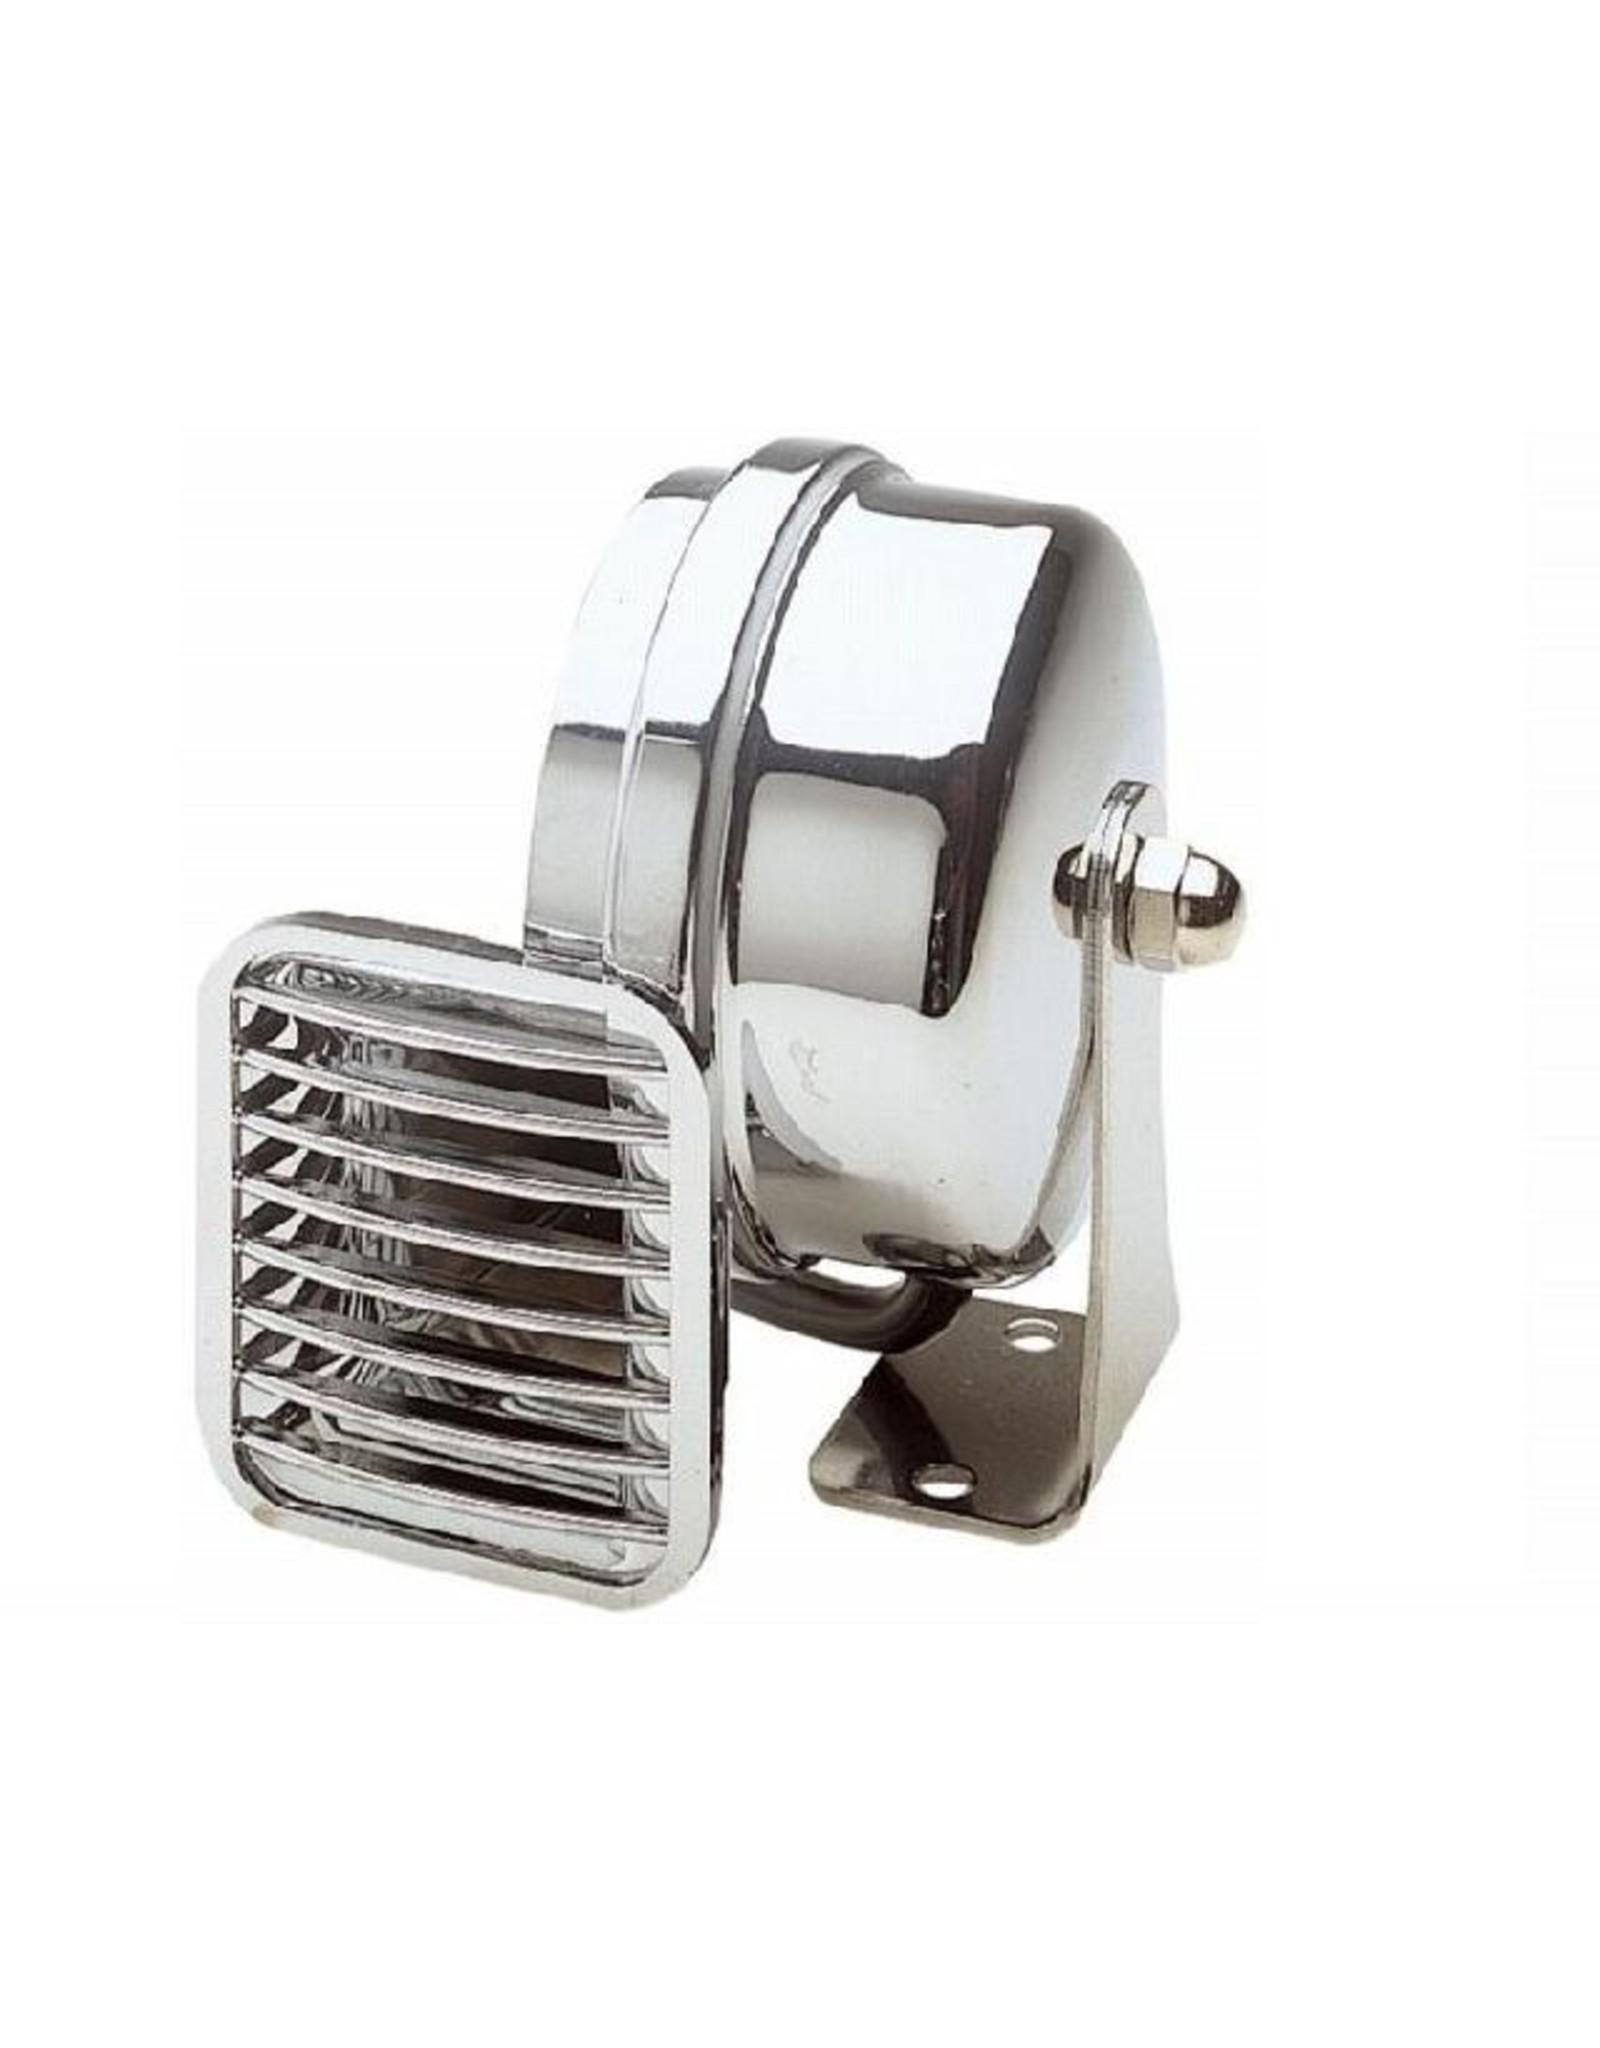 Osculati elektrische 12v diafragma horn